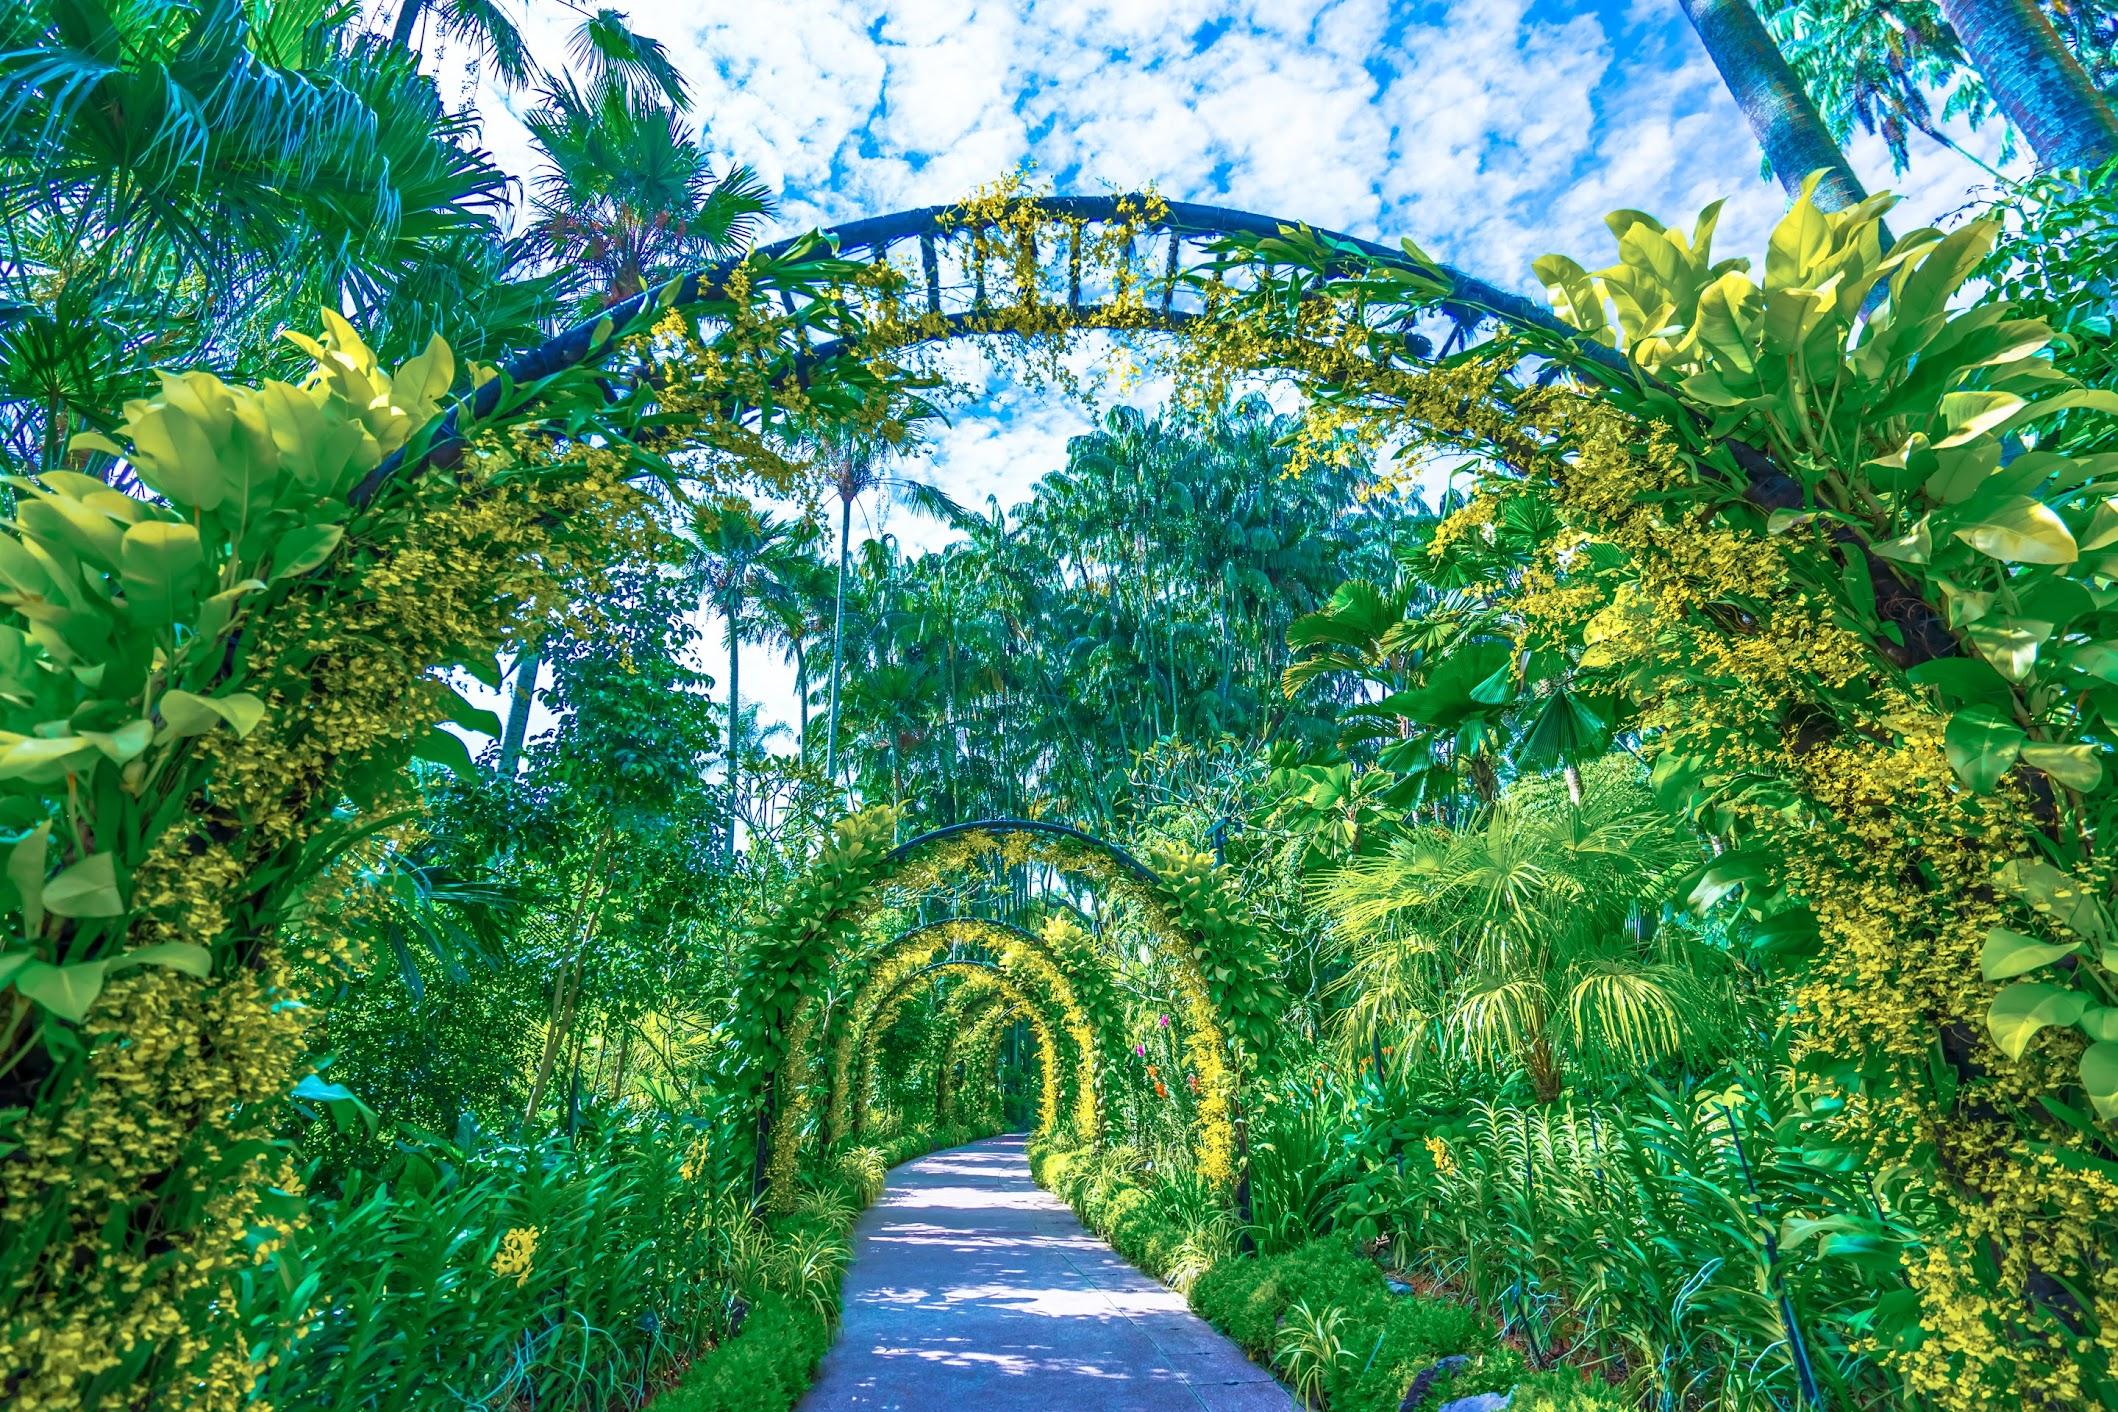 Singapore Botanic Gardens National Orchid Garden4